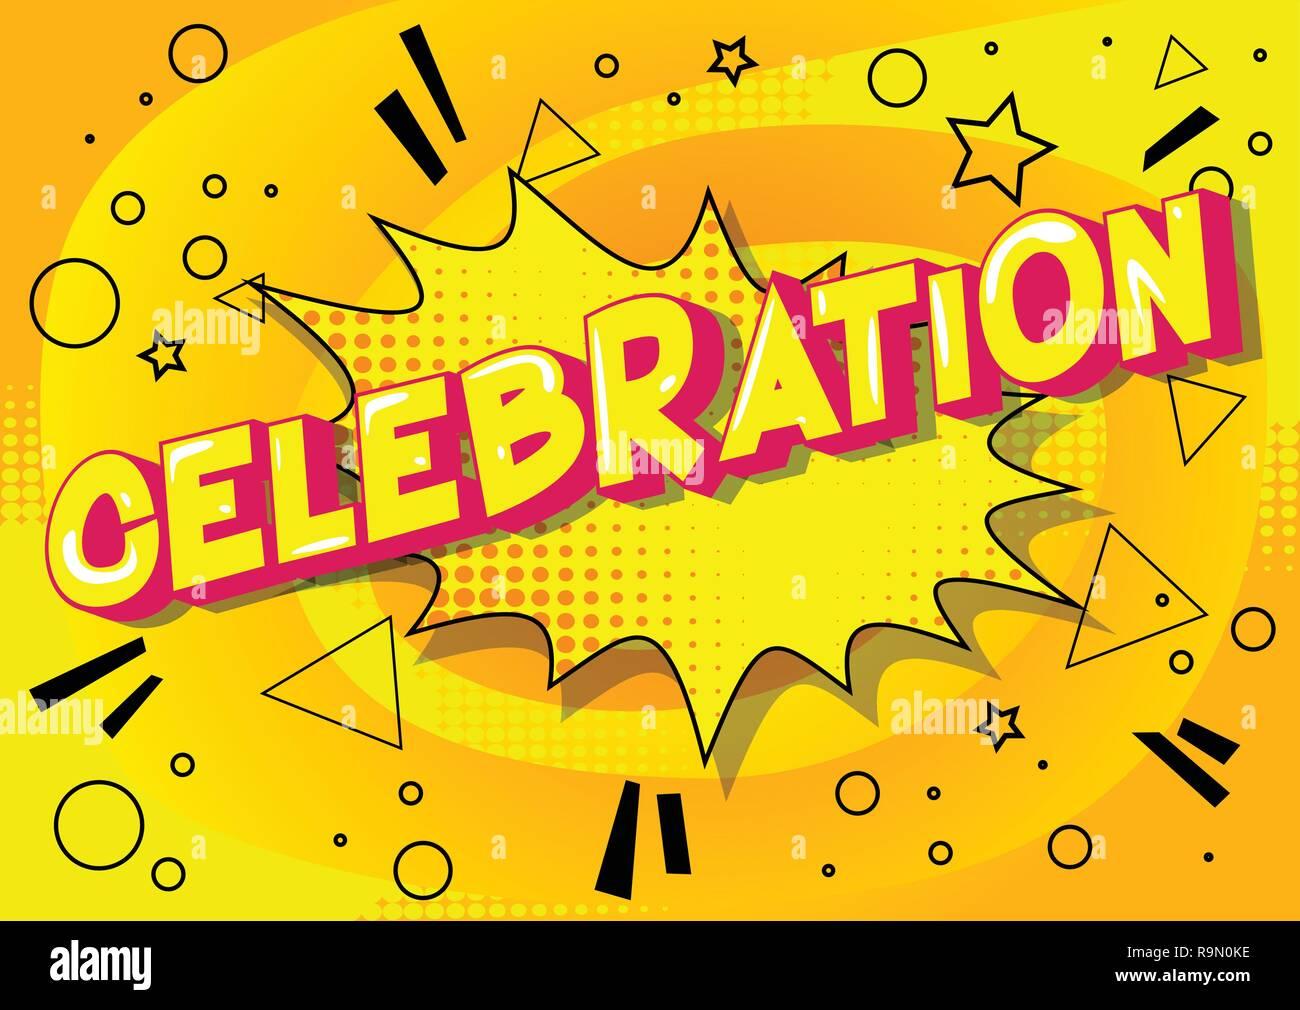 Celebración Vector Estilo Cómic Ilustrado Frase Sobre